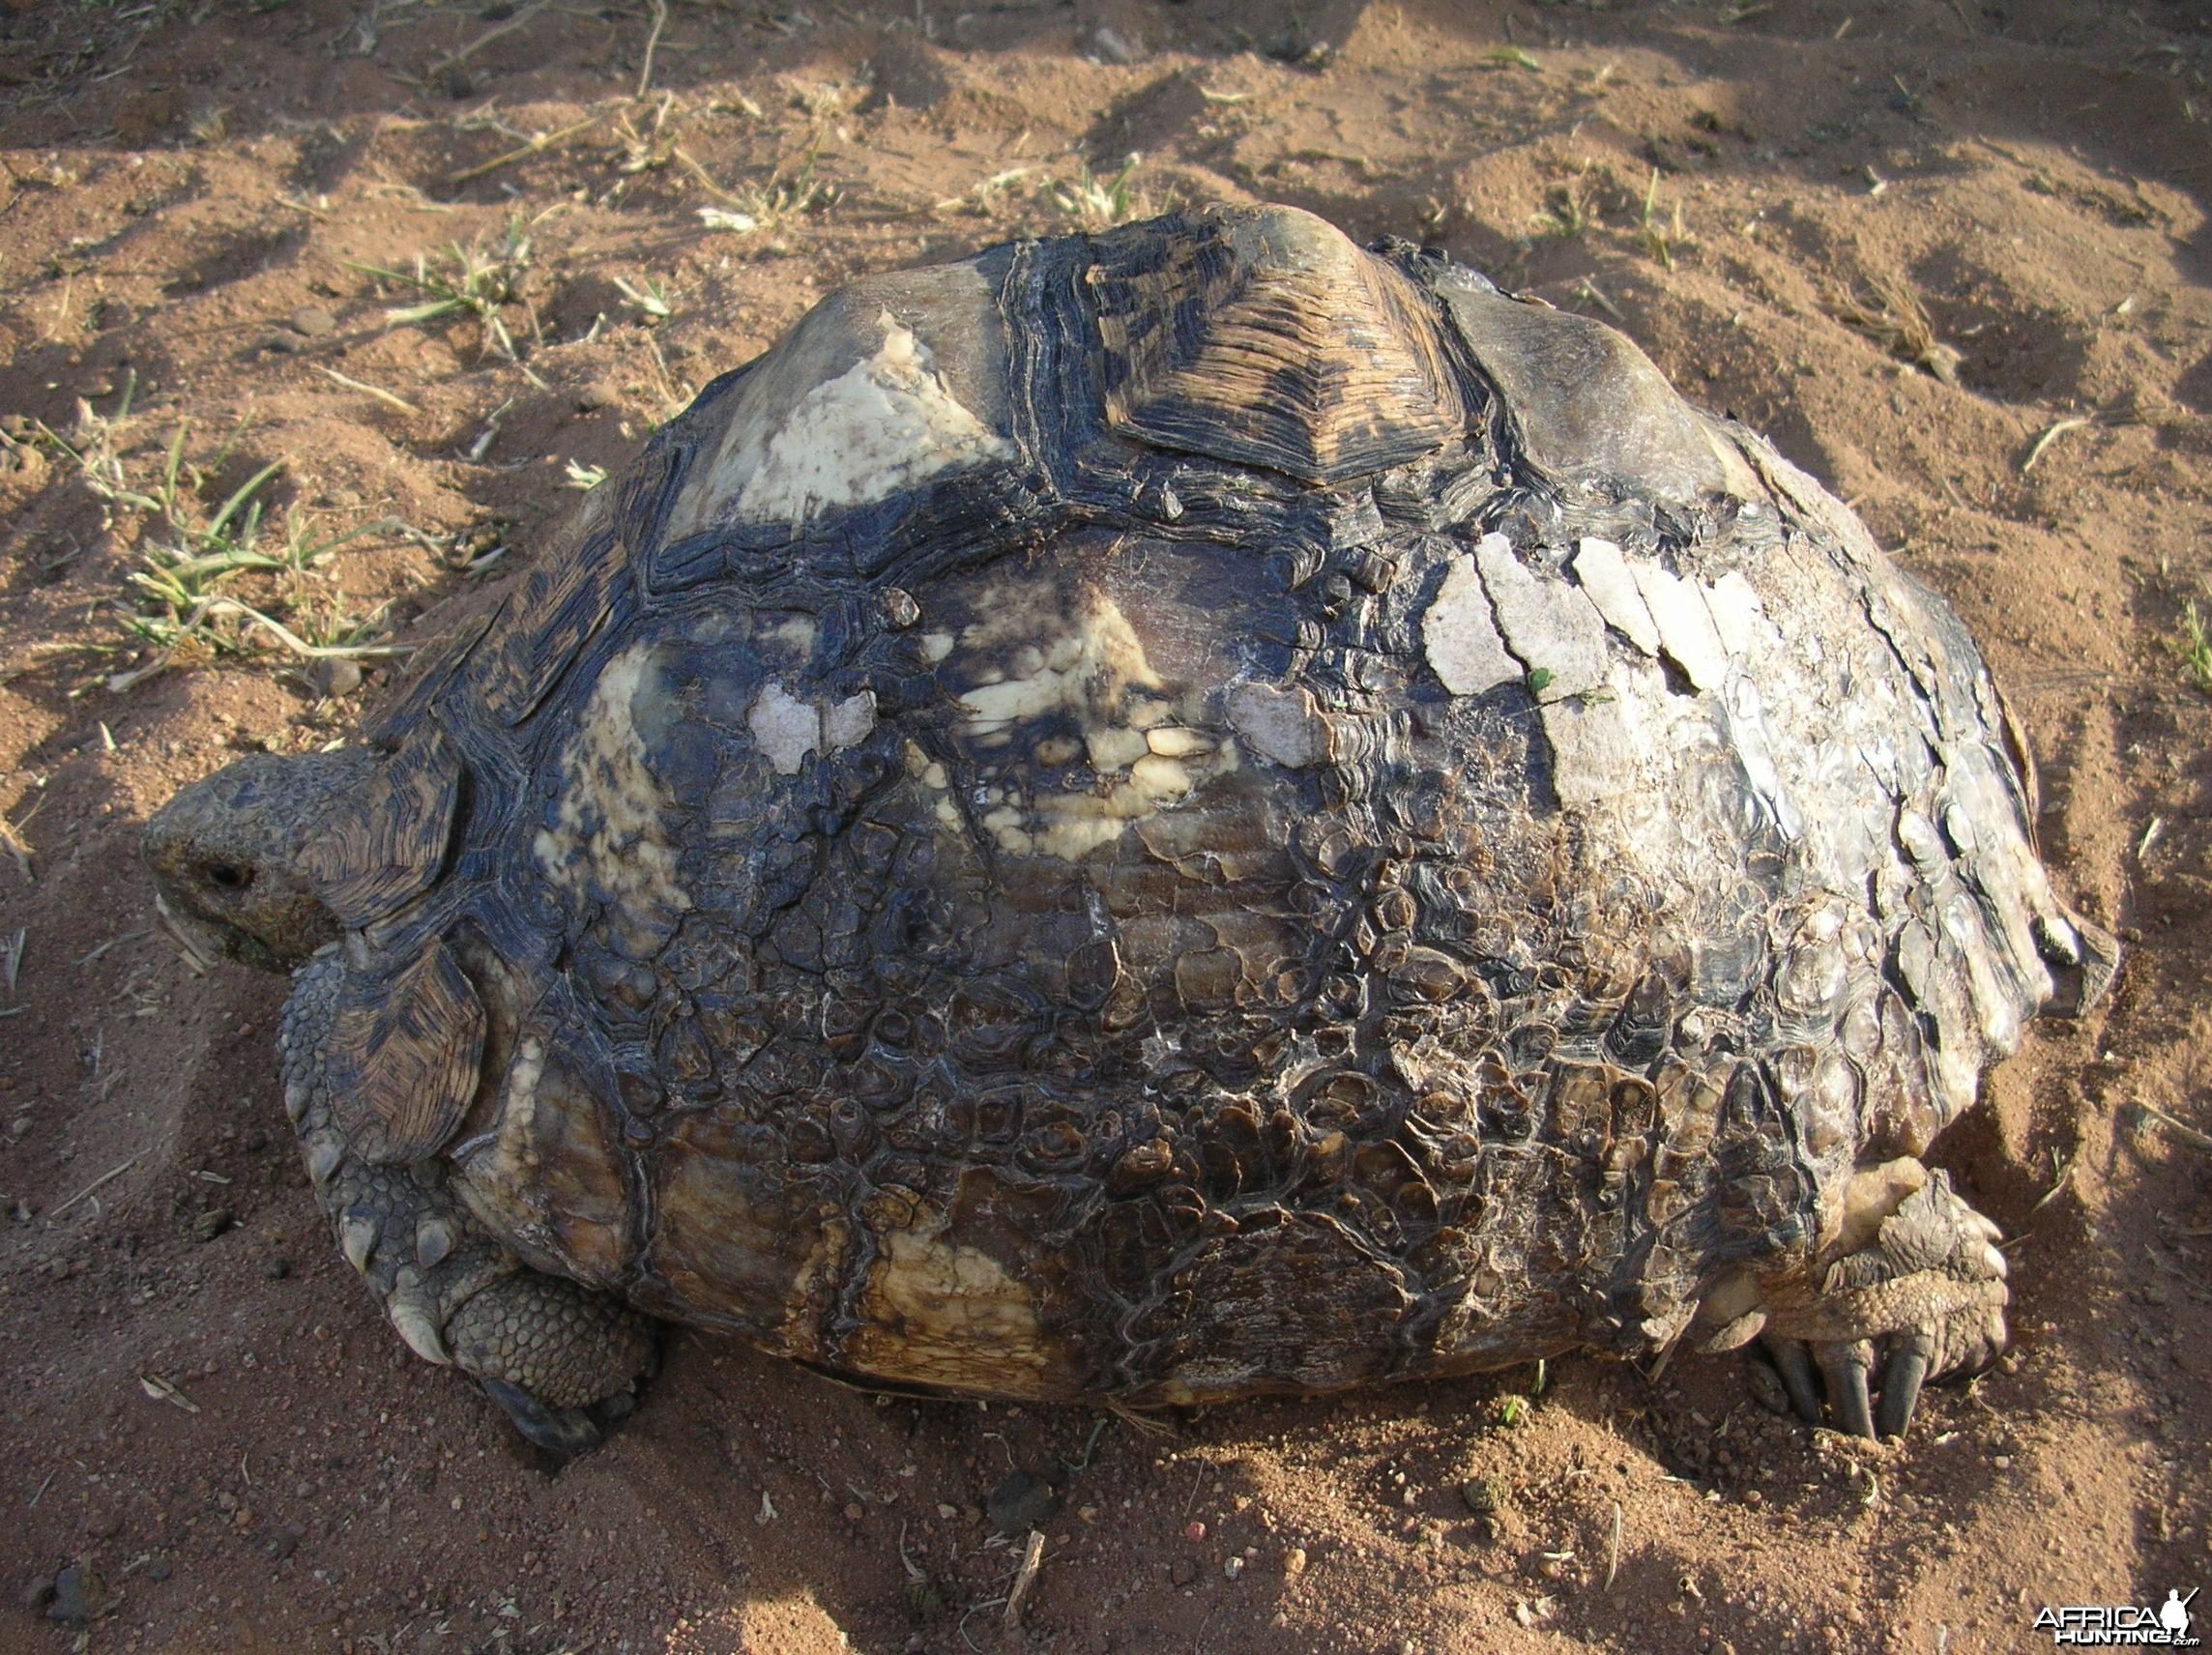 Leopard Tortoise in Namibia